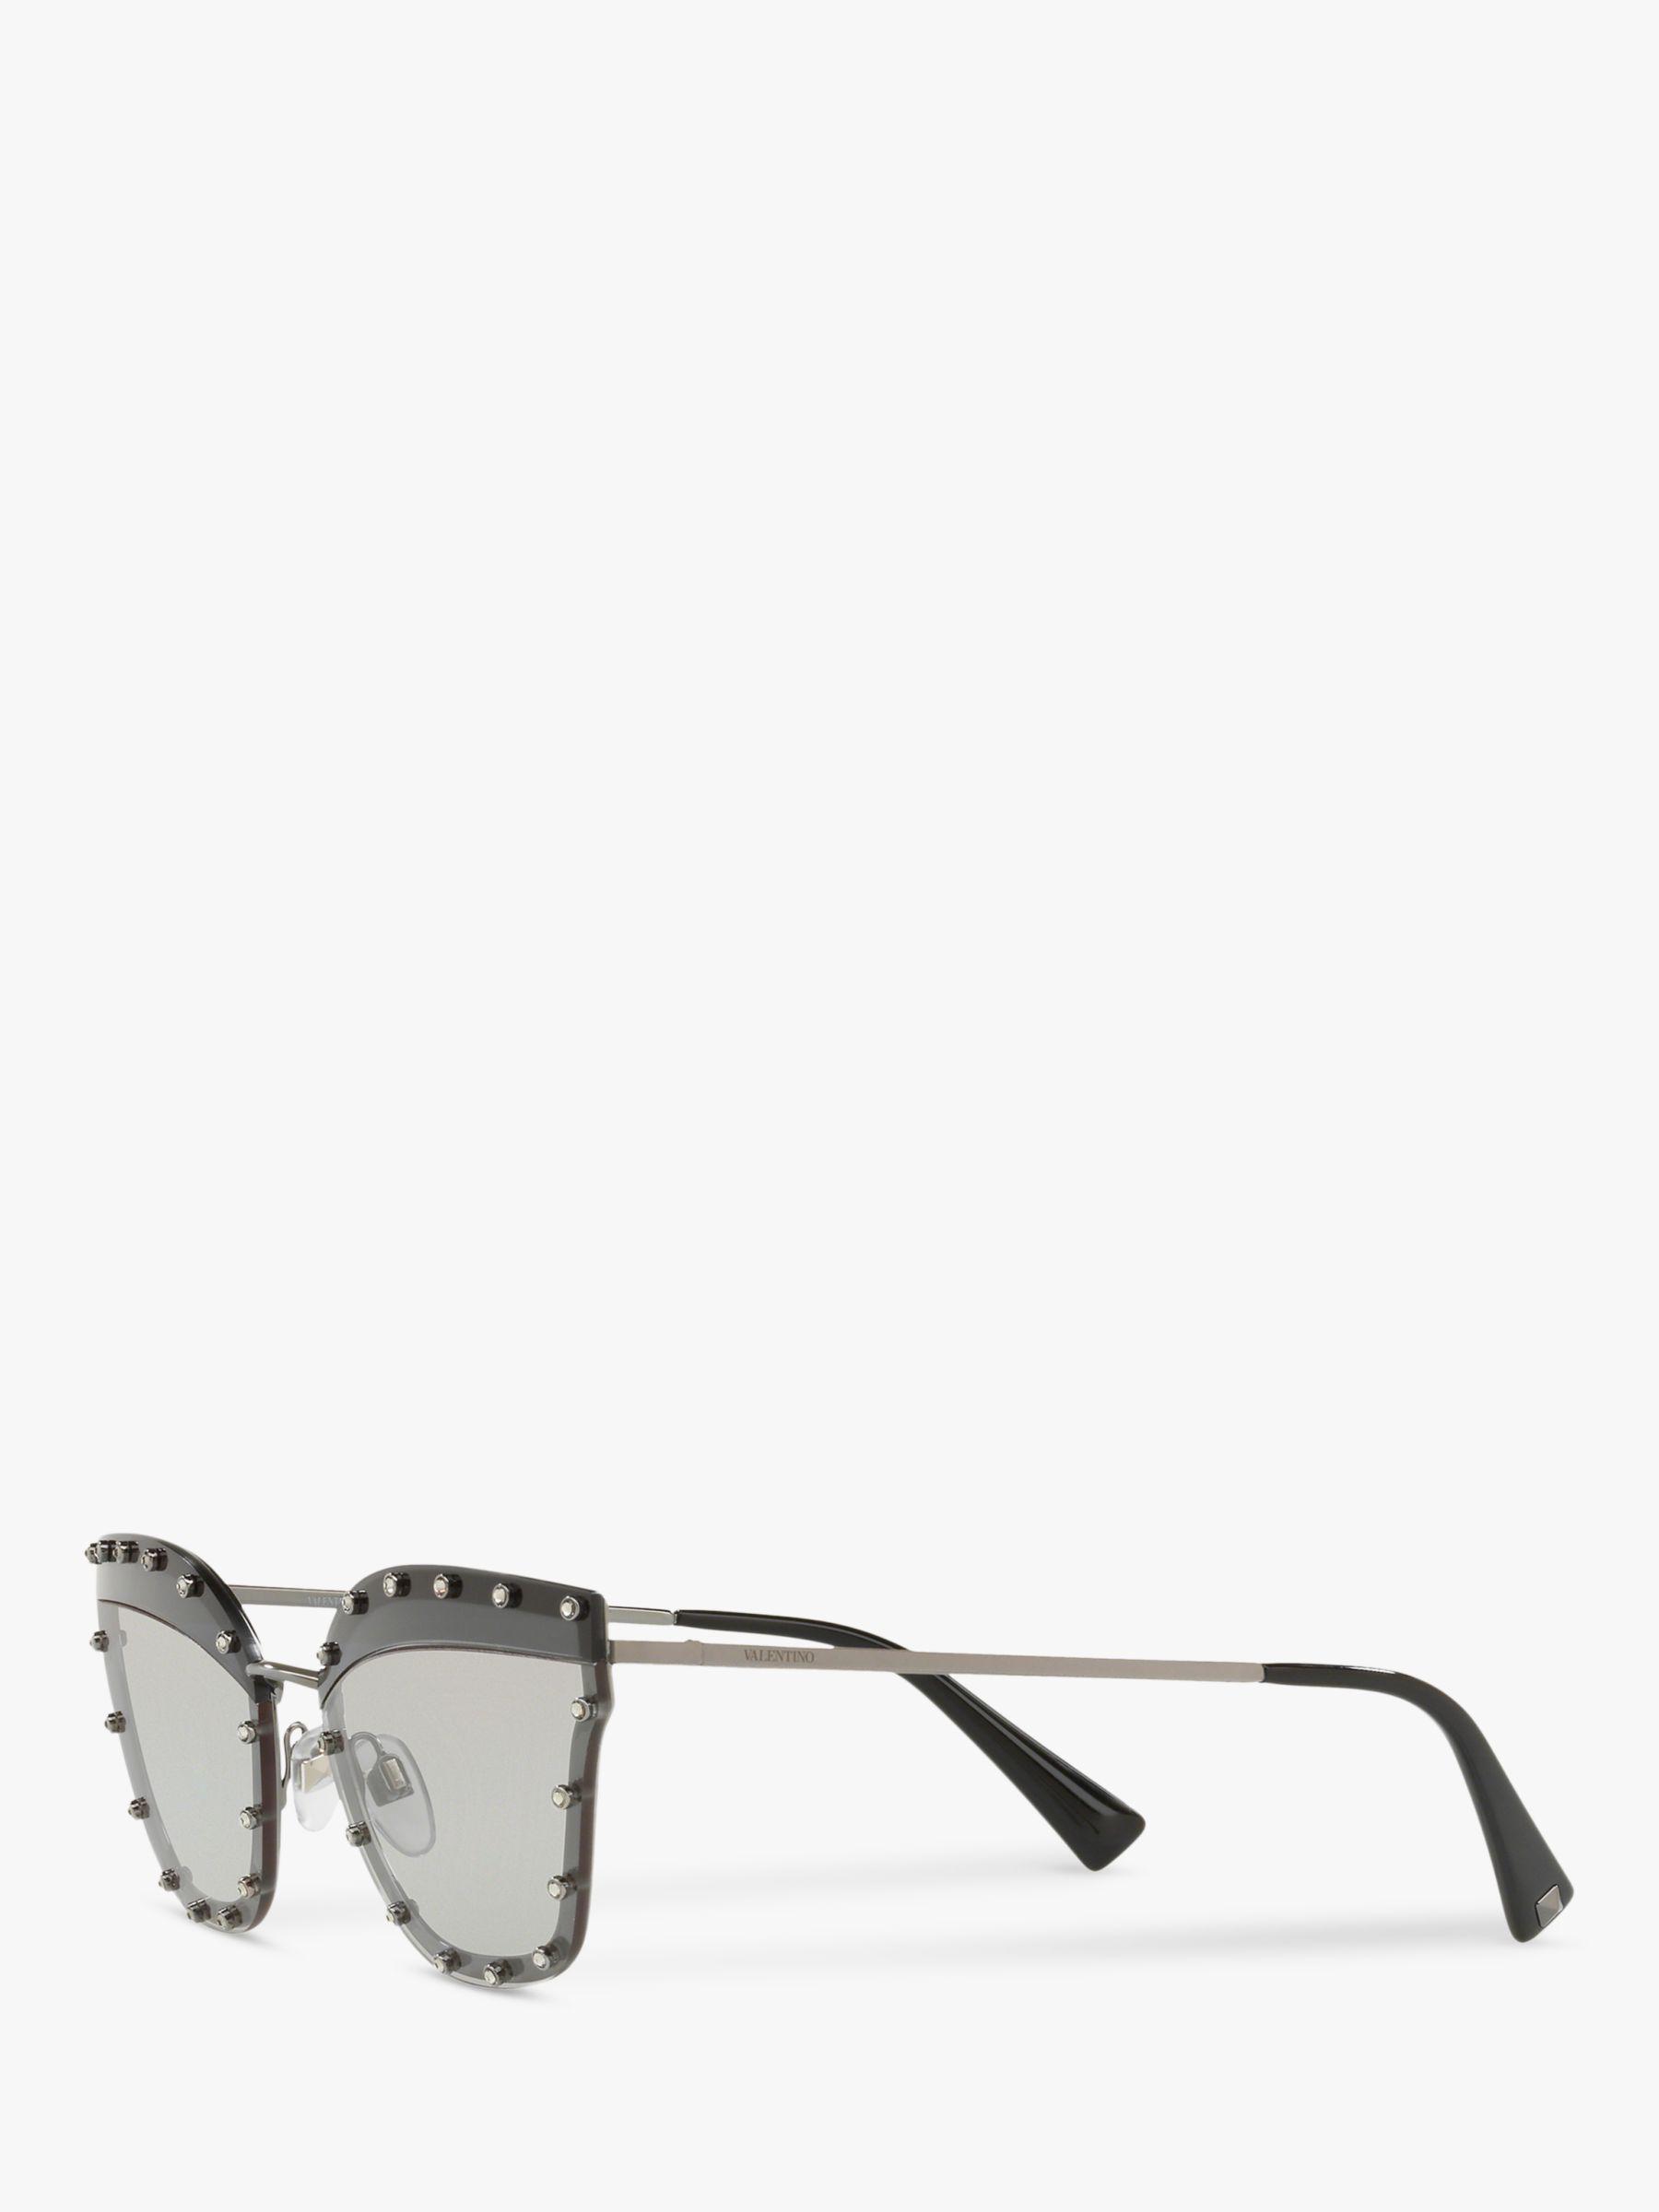 719a821fb81fd Valentino Va2028 Women s Cat s Eye Sunglasses in Gray - Lyst